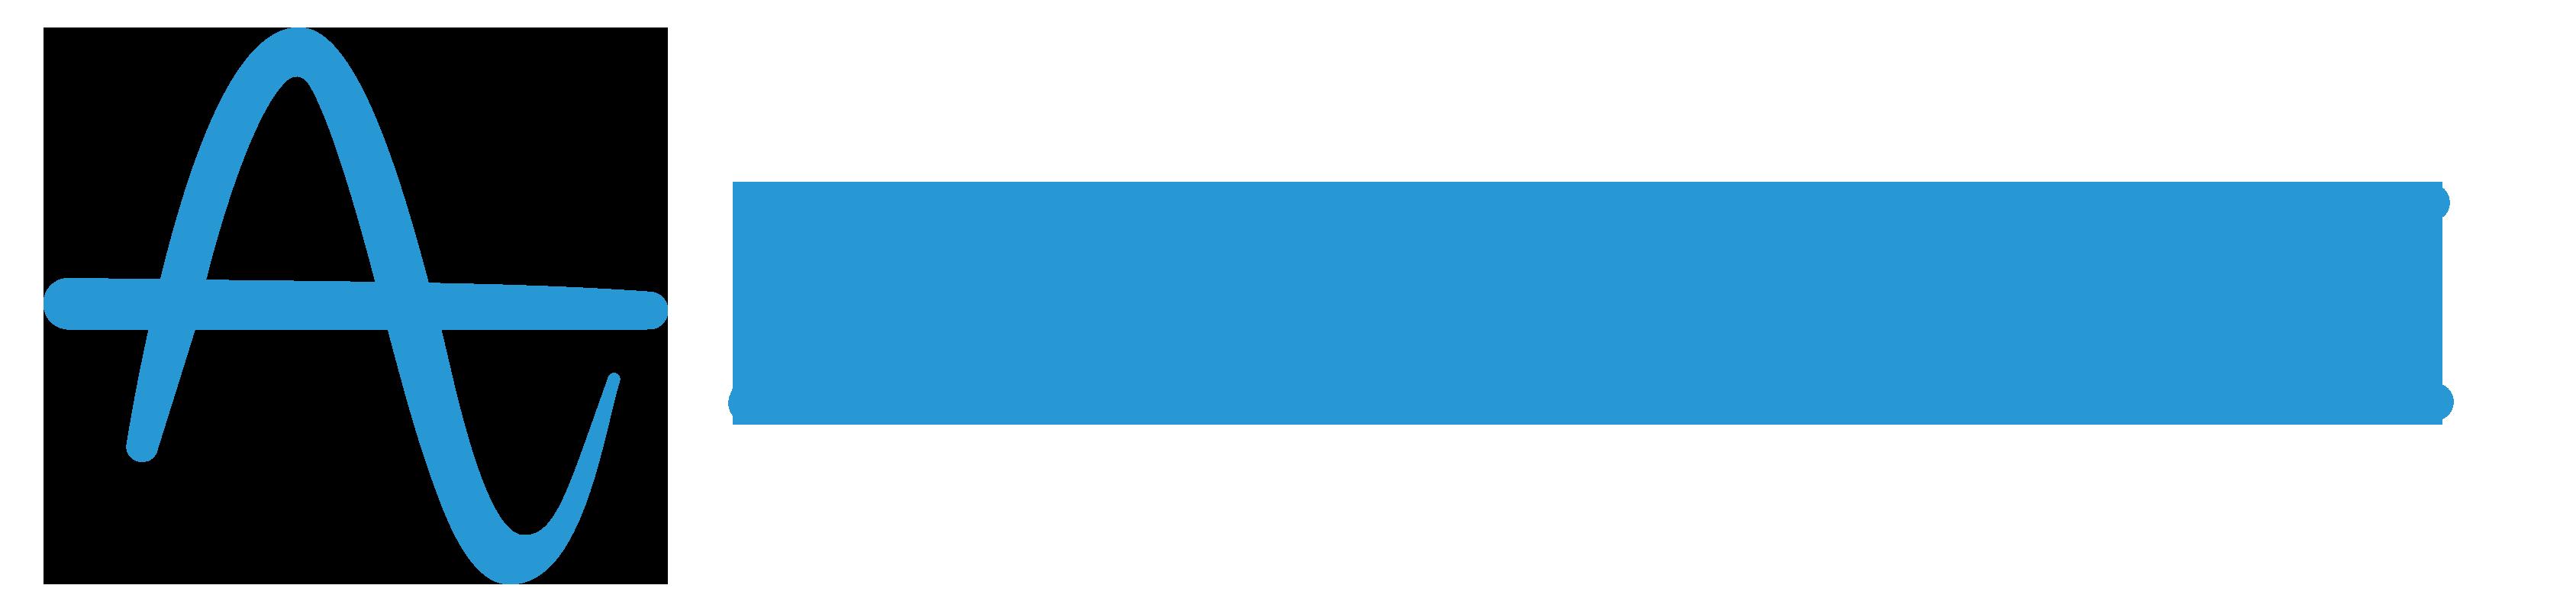 Amplitude-logo.png